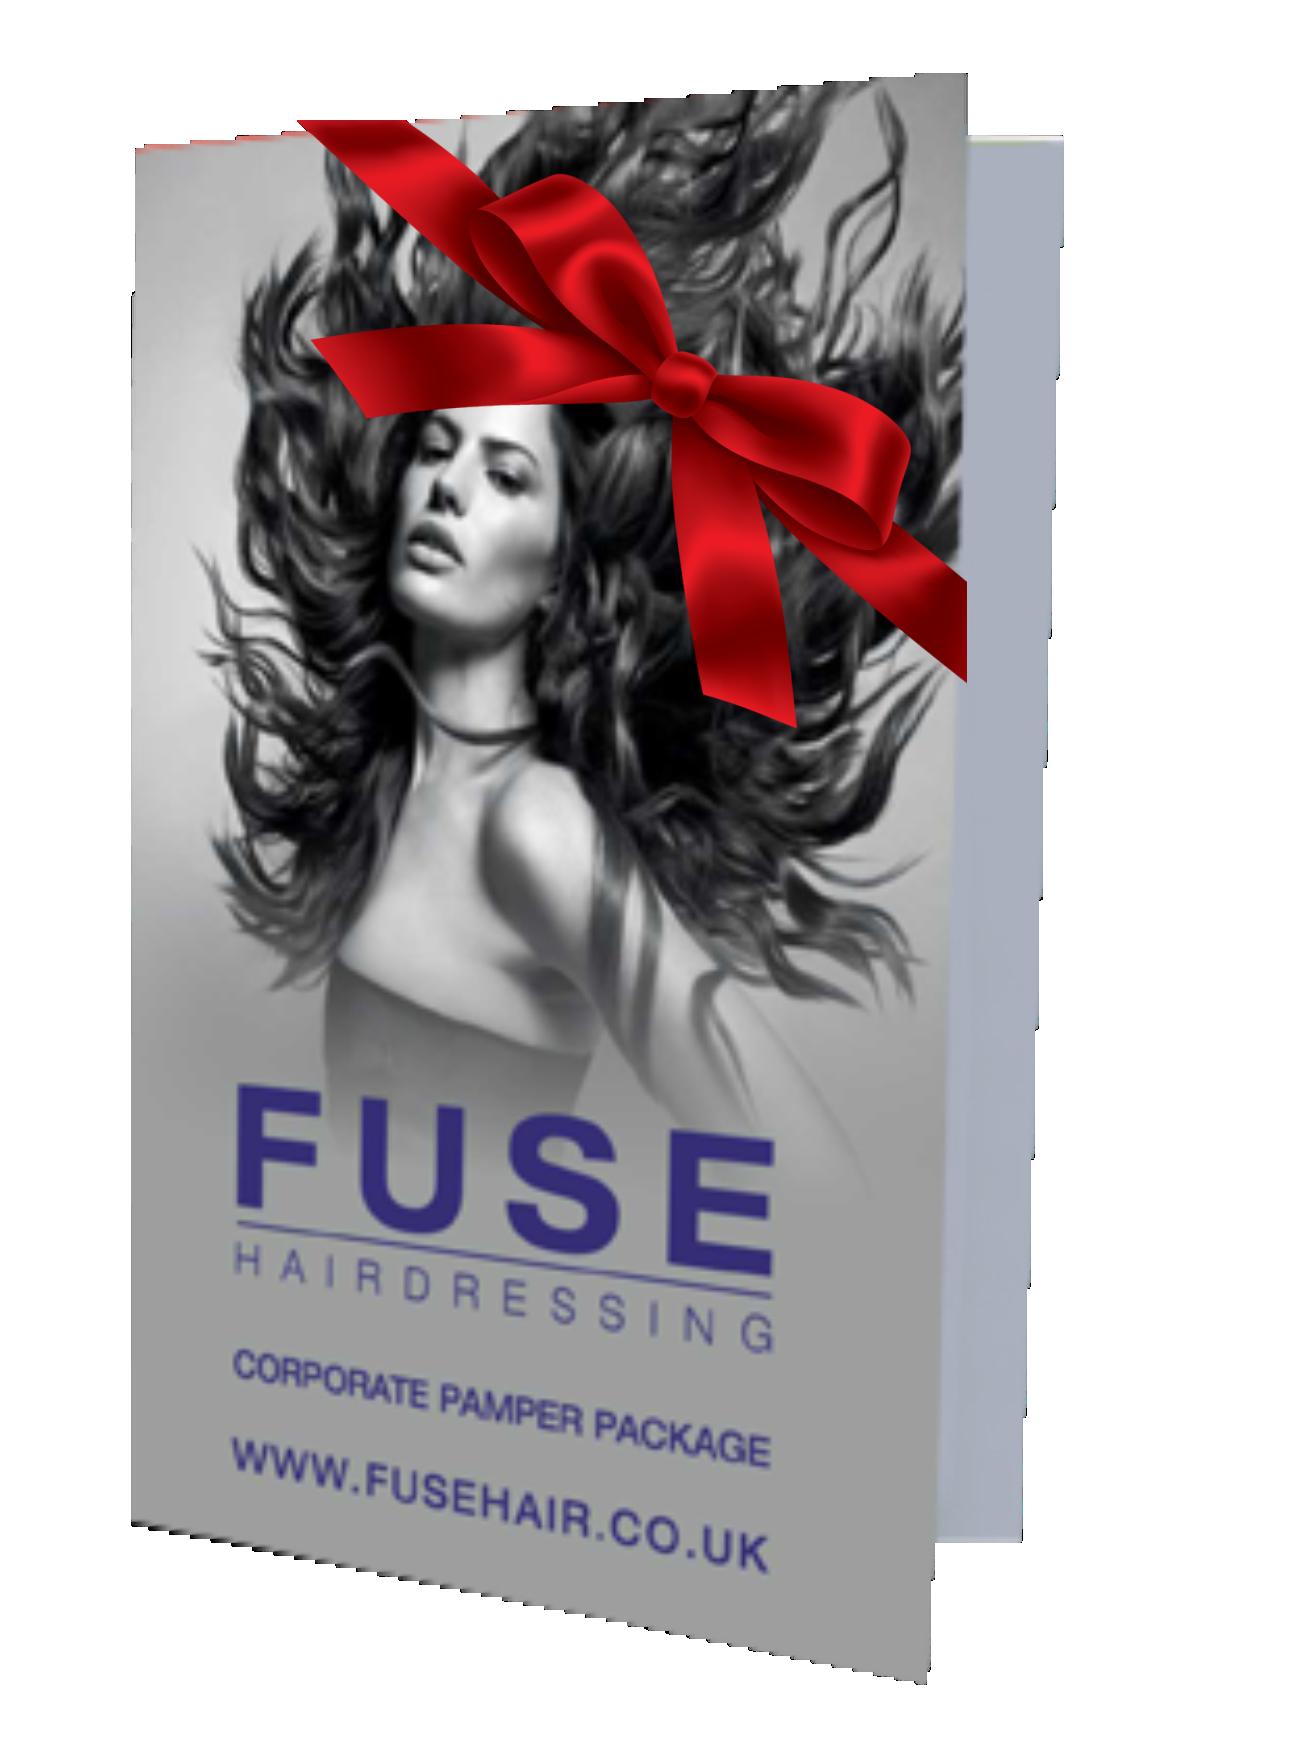 hairdresser offers Fuse Hairdressing